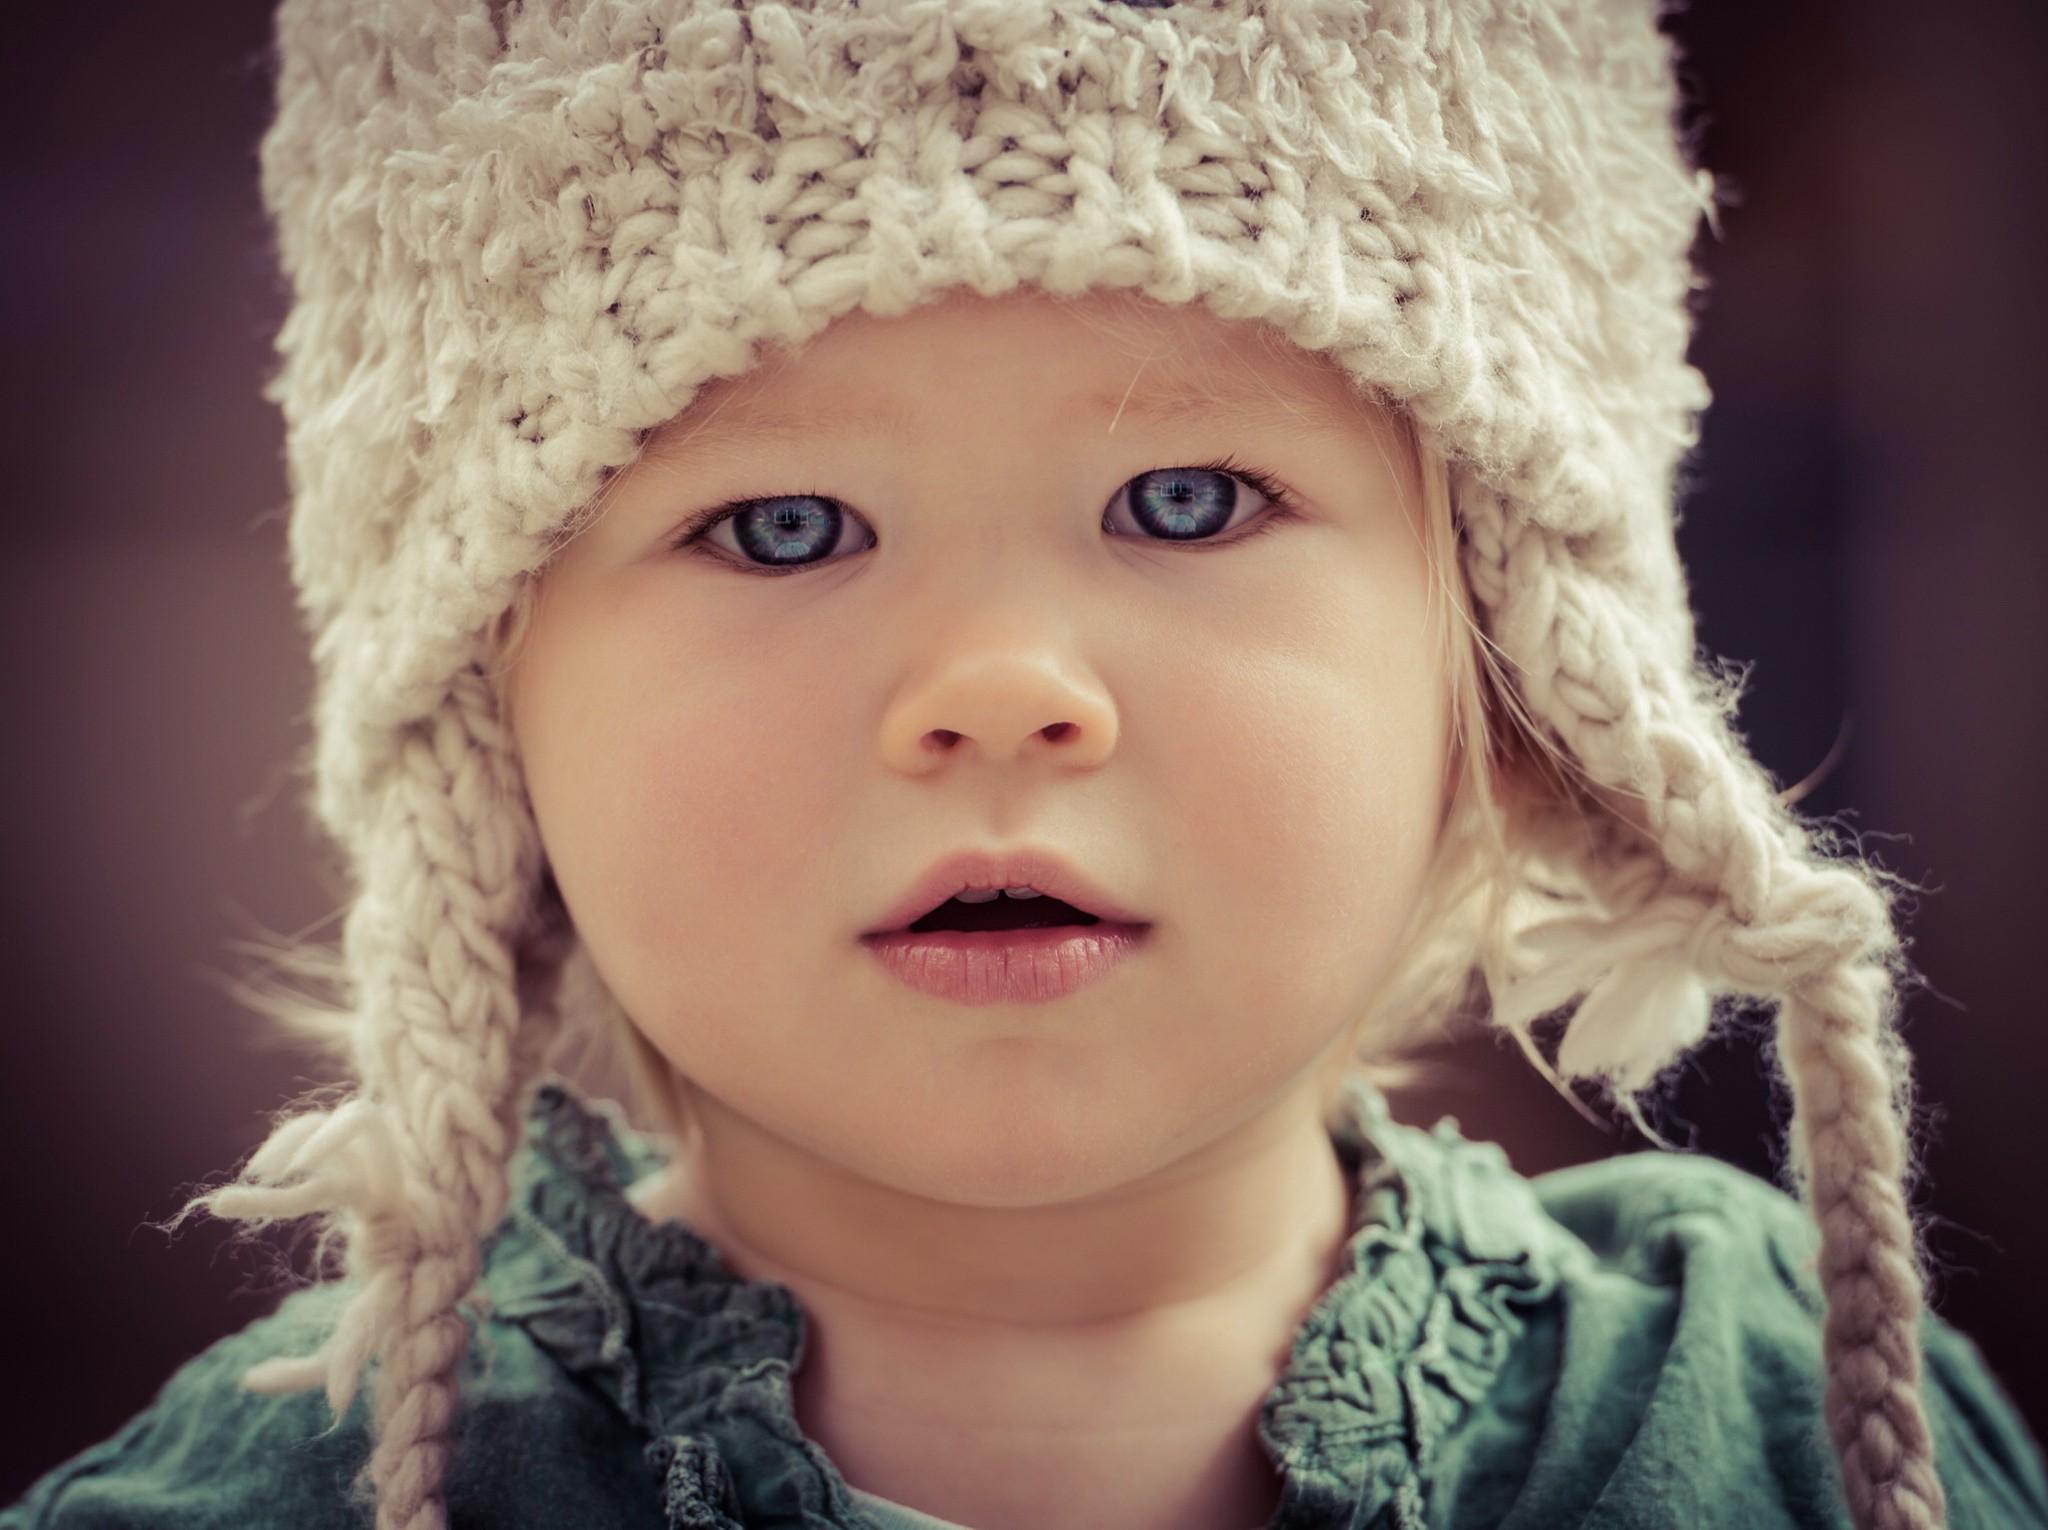 Wallpaper : face, model, blue eyes, children, baby, Person ...